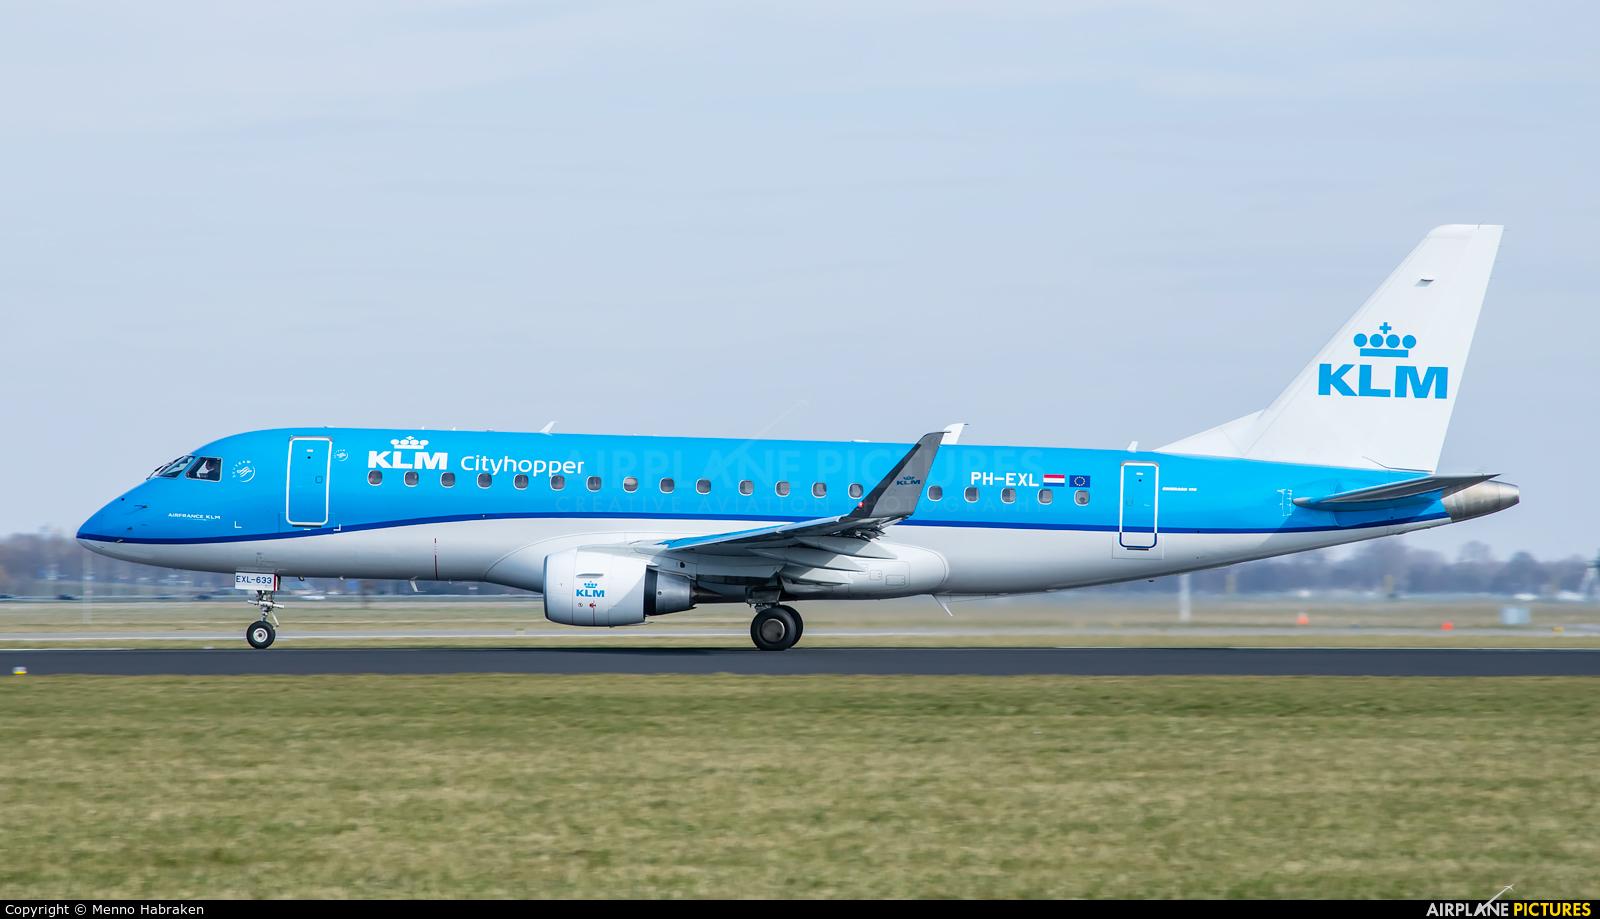 KLM Cityhopper PH-EXL aircraft at Amsterdam - Schiphol